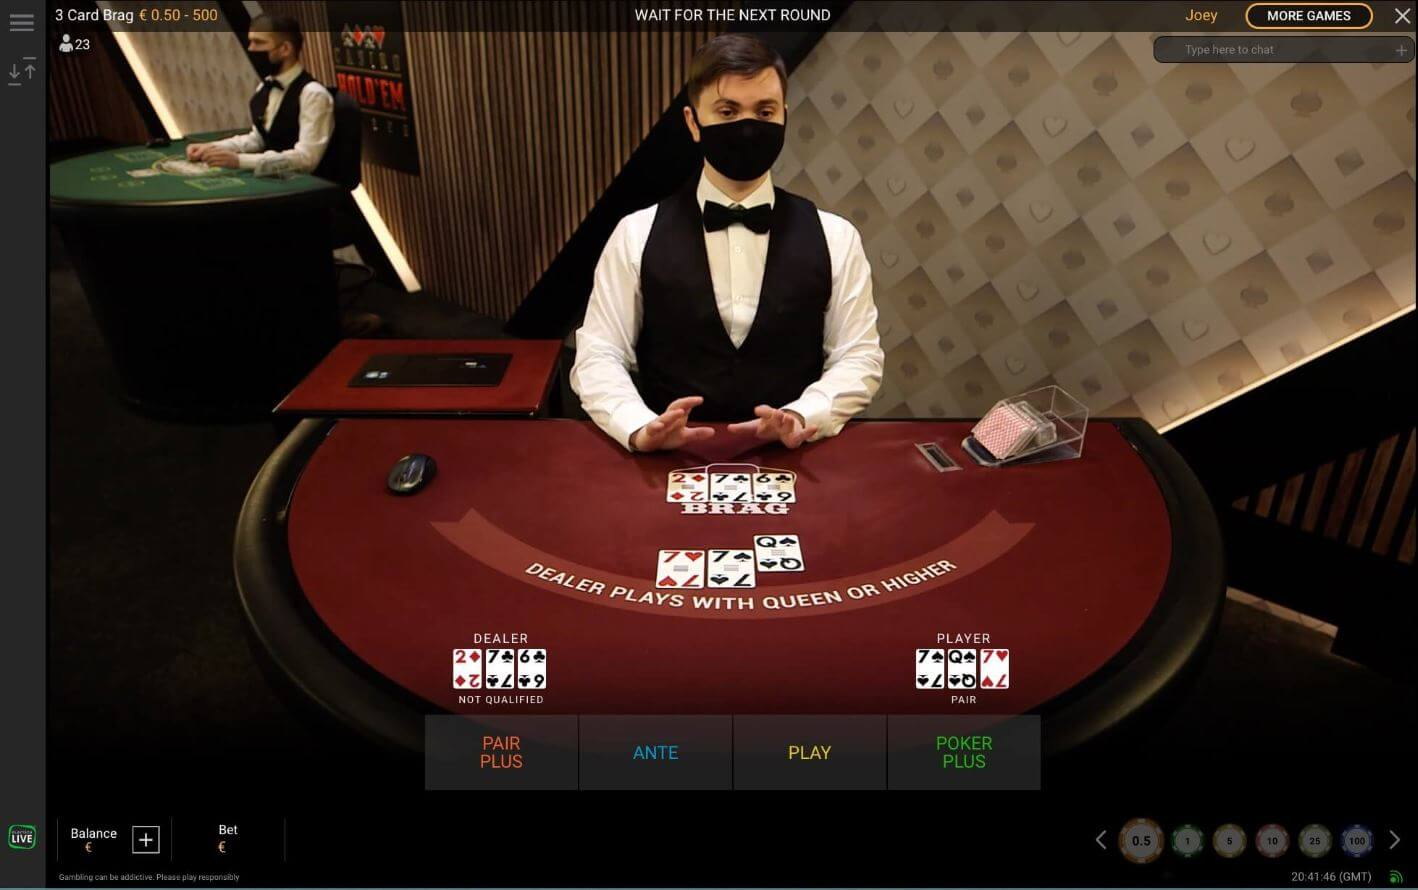 Live Poker Online - 3 Card Brag by Playtech